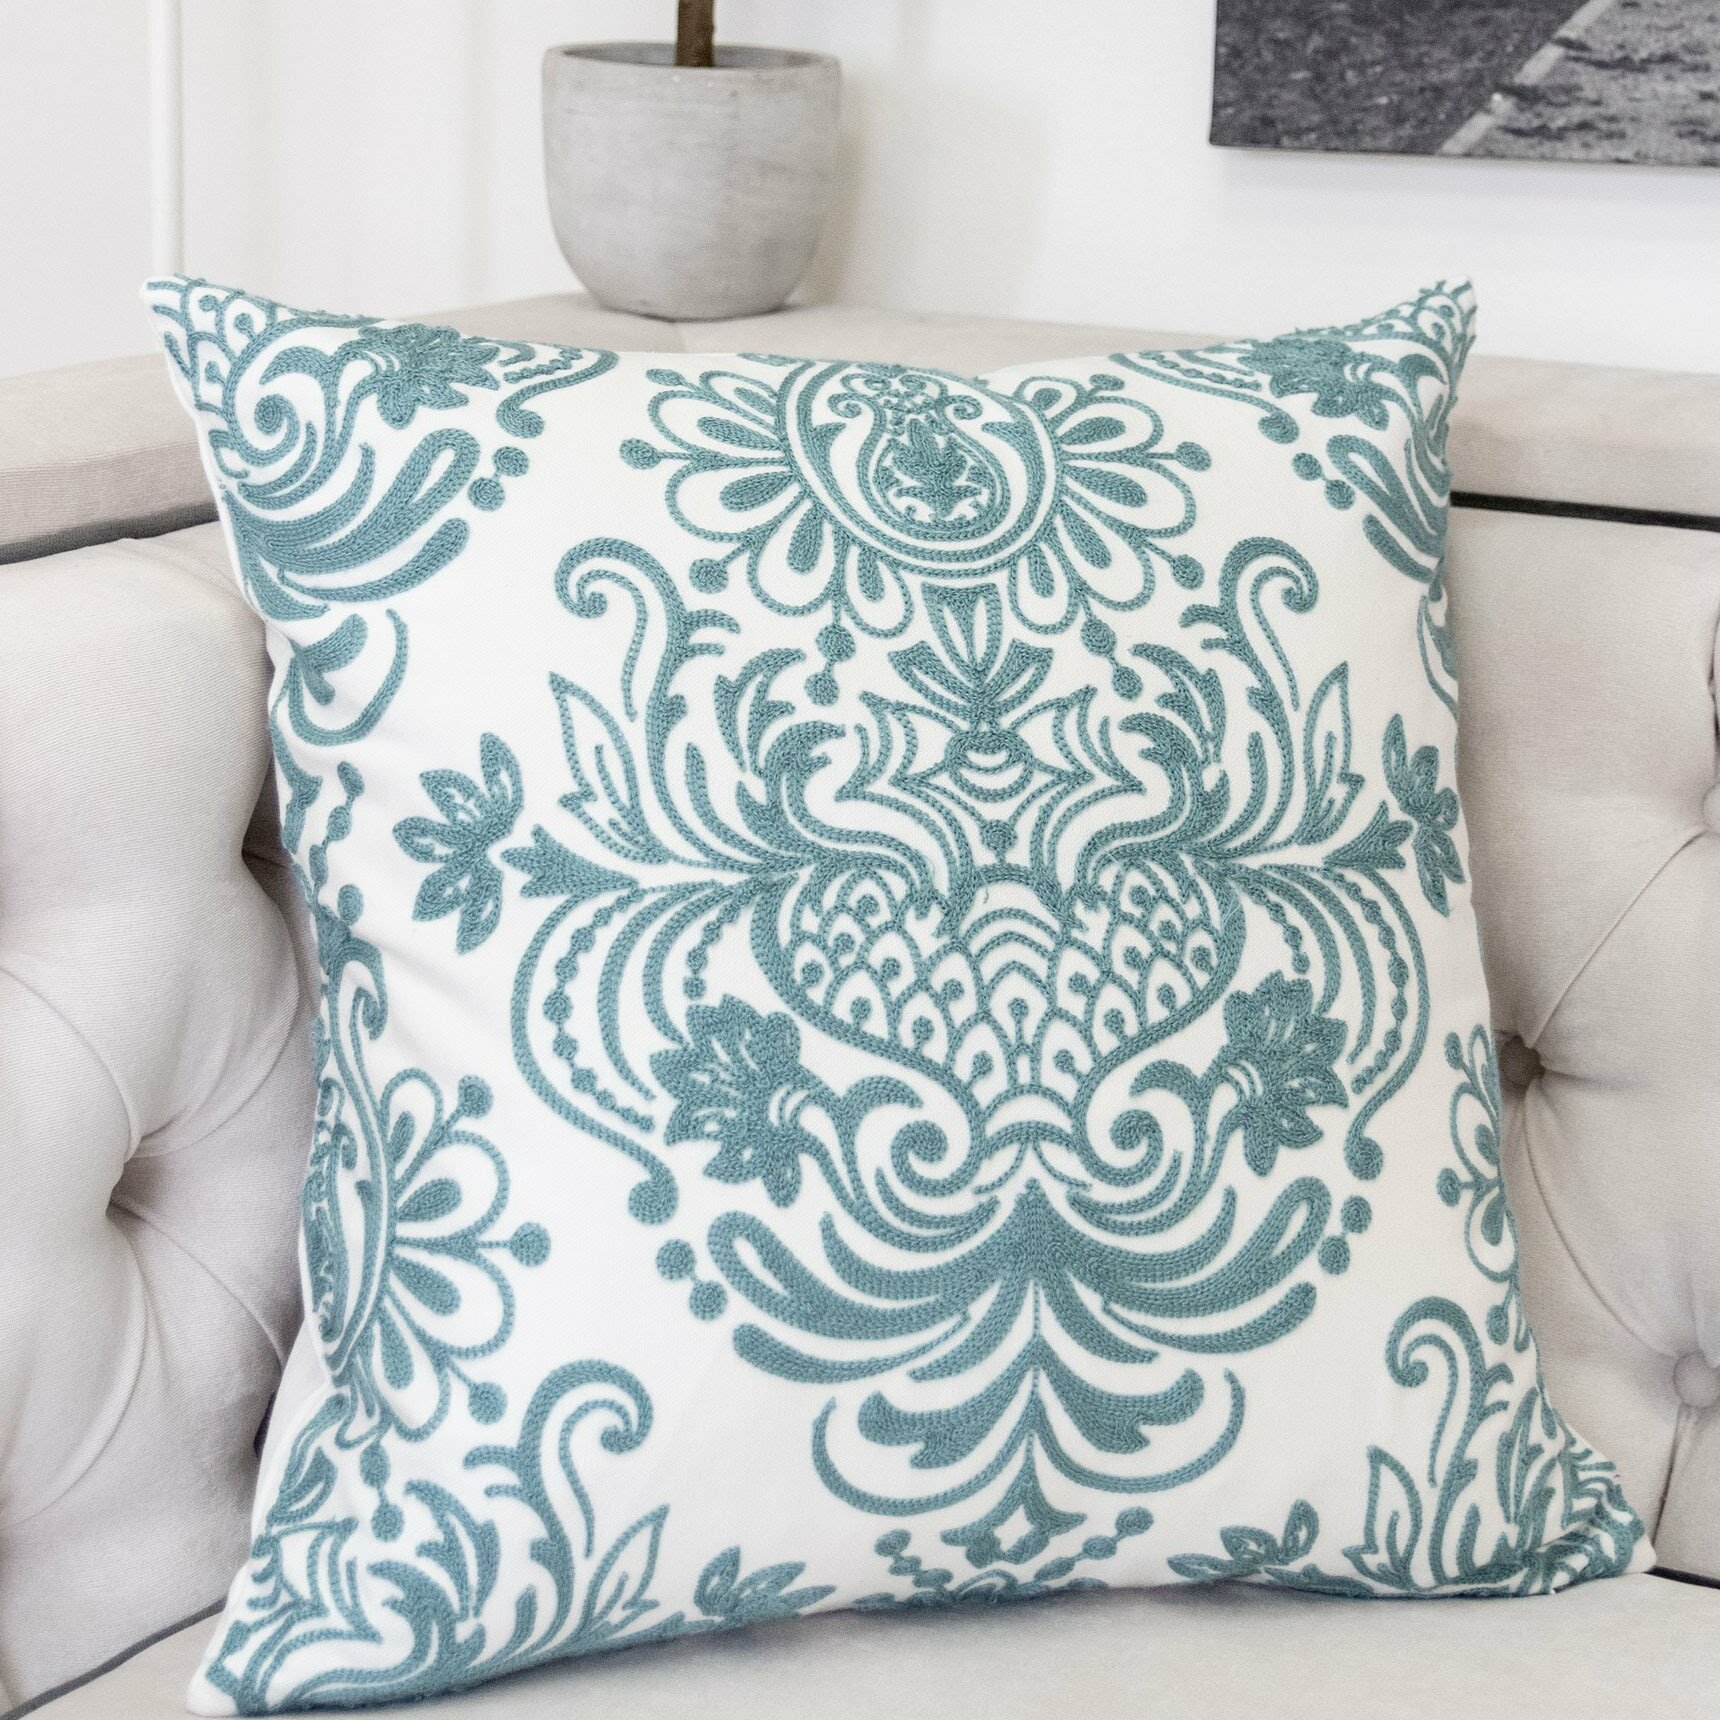 Charlton Home Caston Indoor Outdoor Cotton Throw Pillow Reviews Wayfair